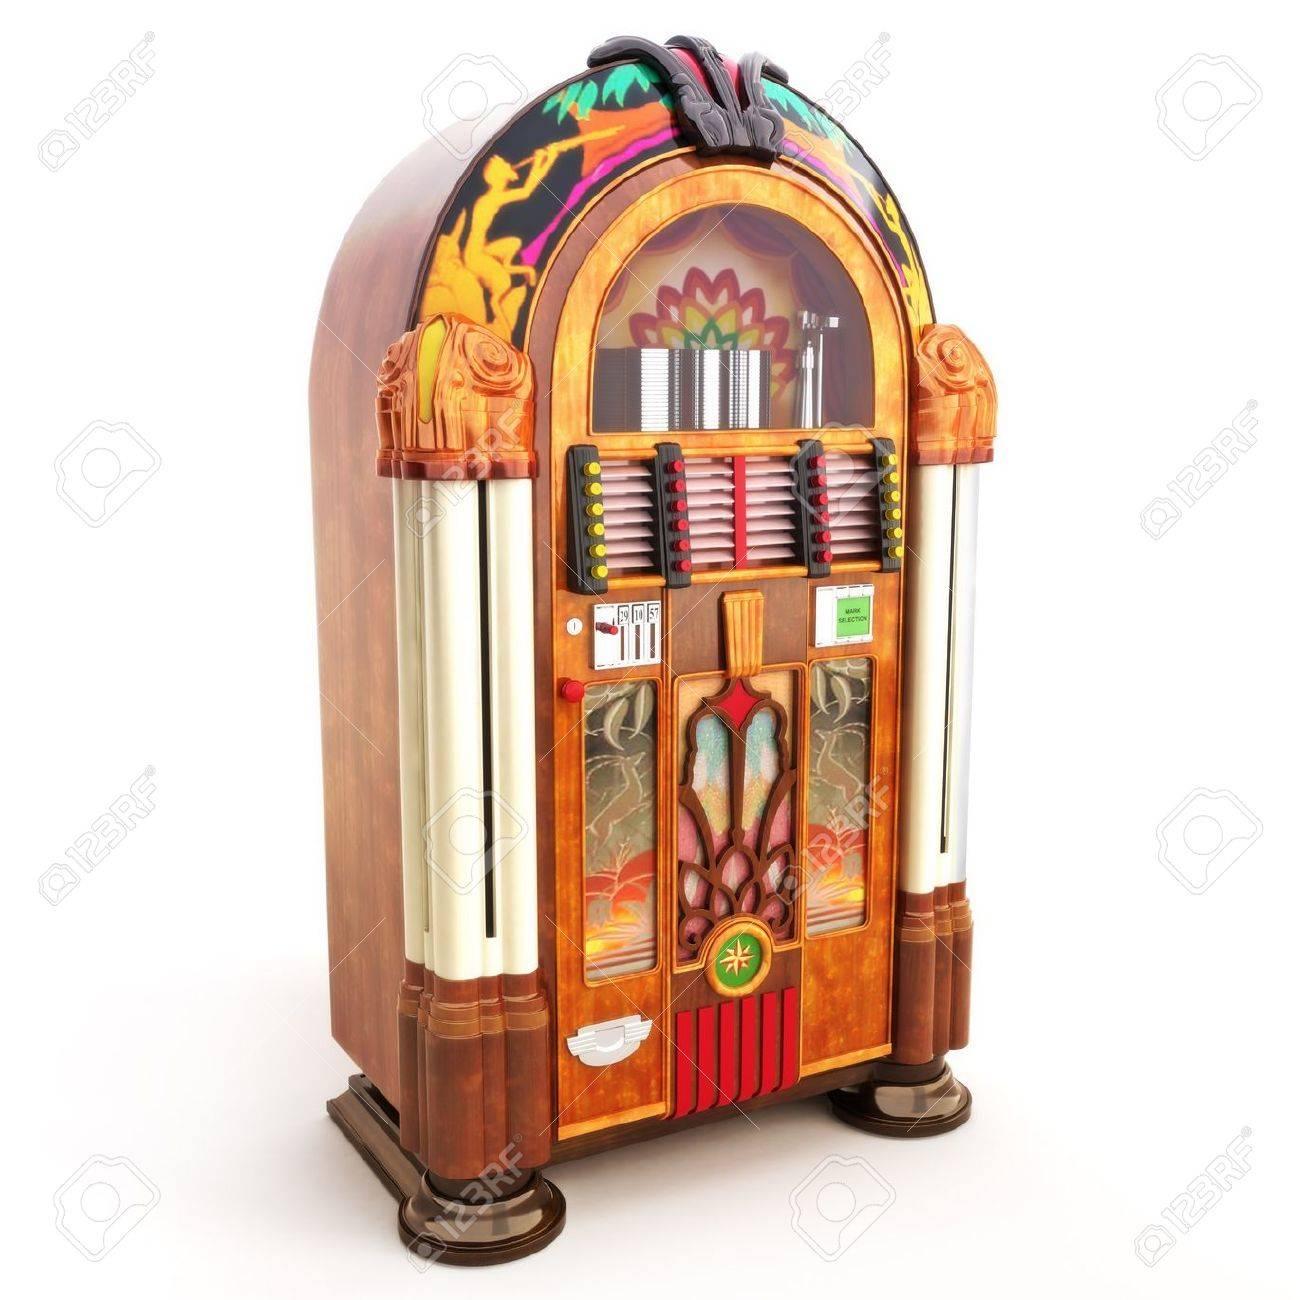 Retro vintage jukebox on a white background 3d model Stock Photo - 14877767